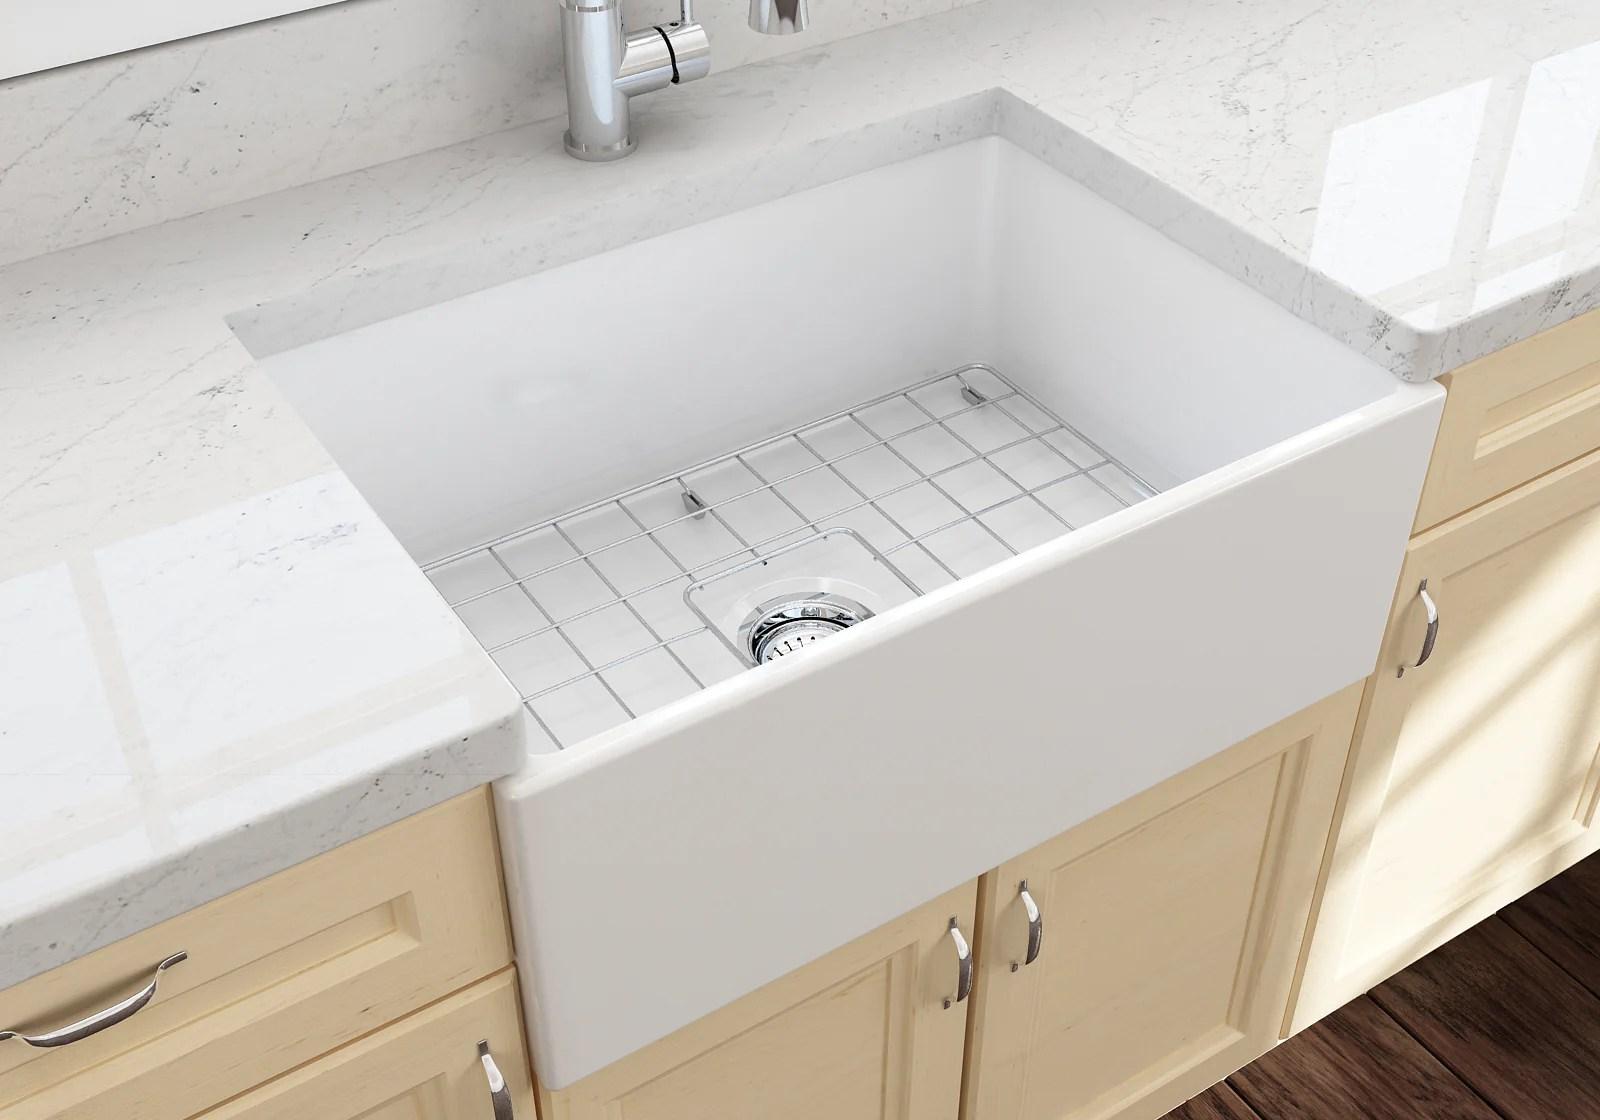 bocchi contempo 27 fireclay farmhouse apron single bowl kitchen sink white 1356 001 0120